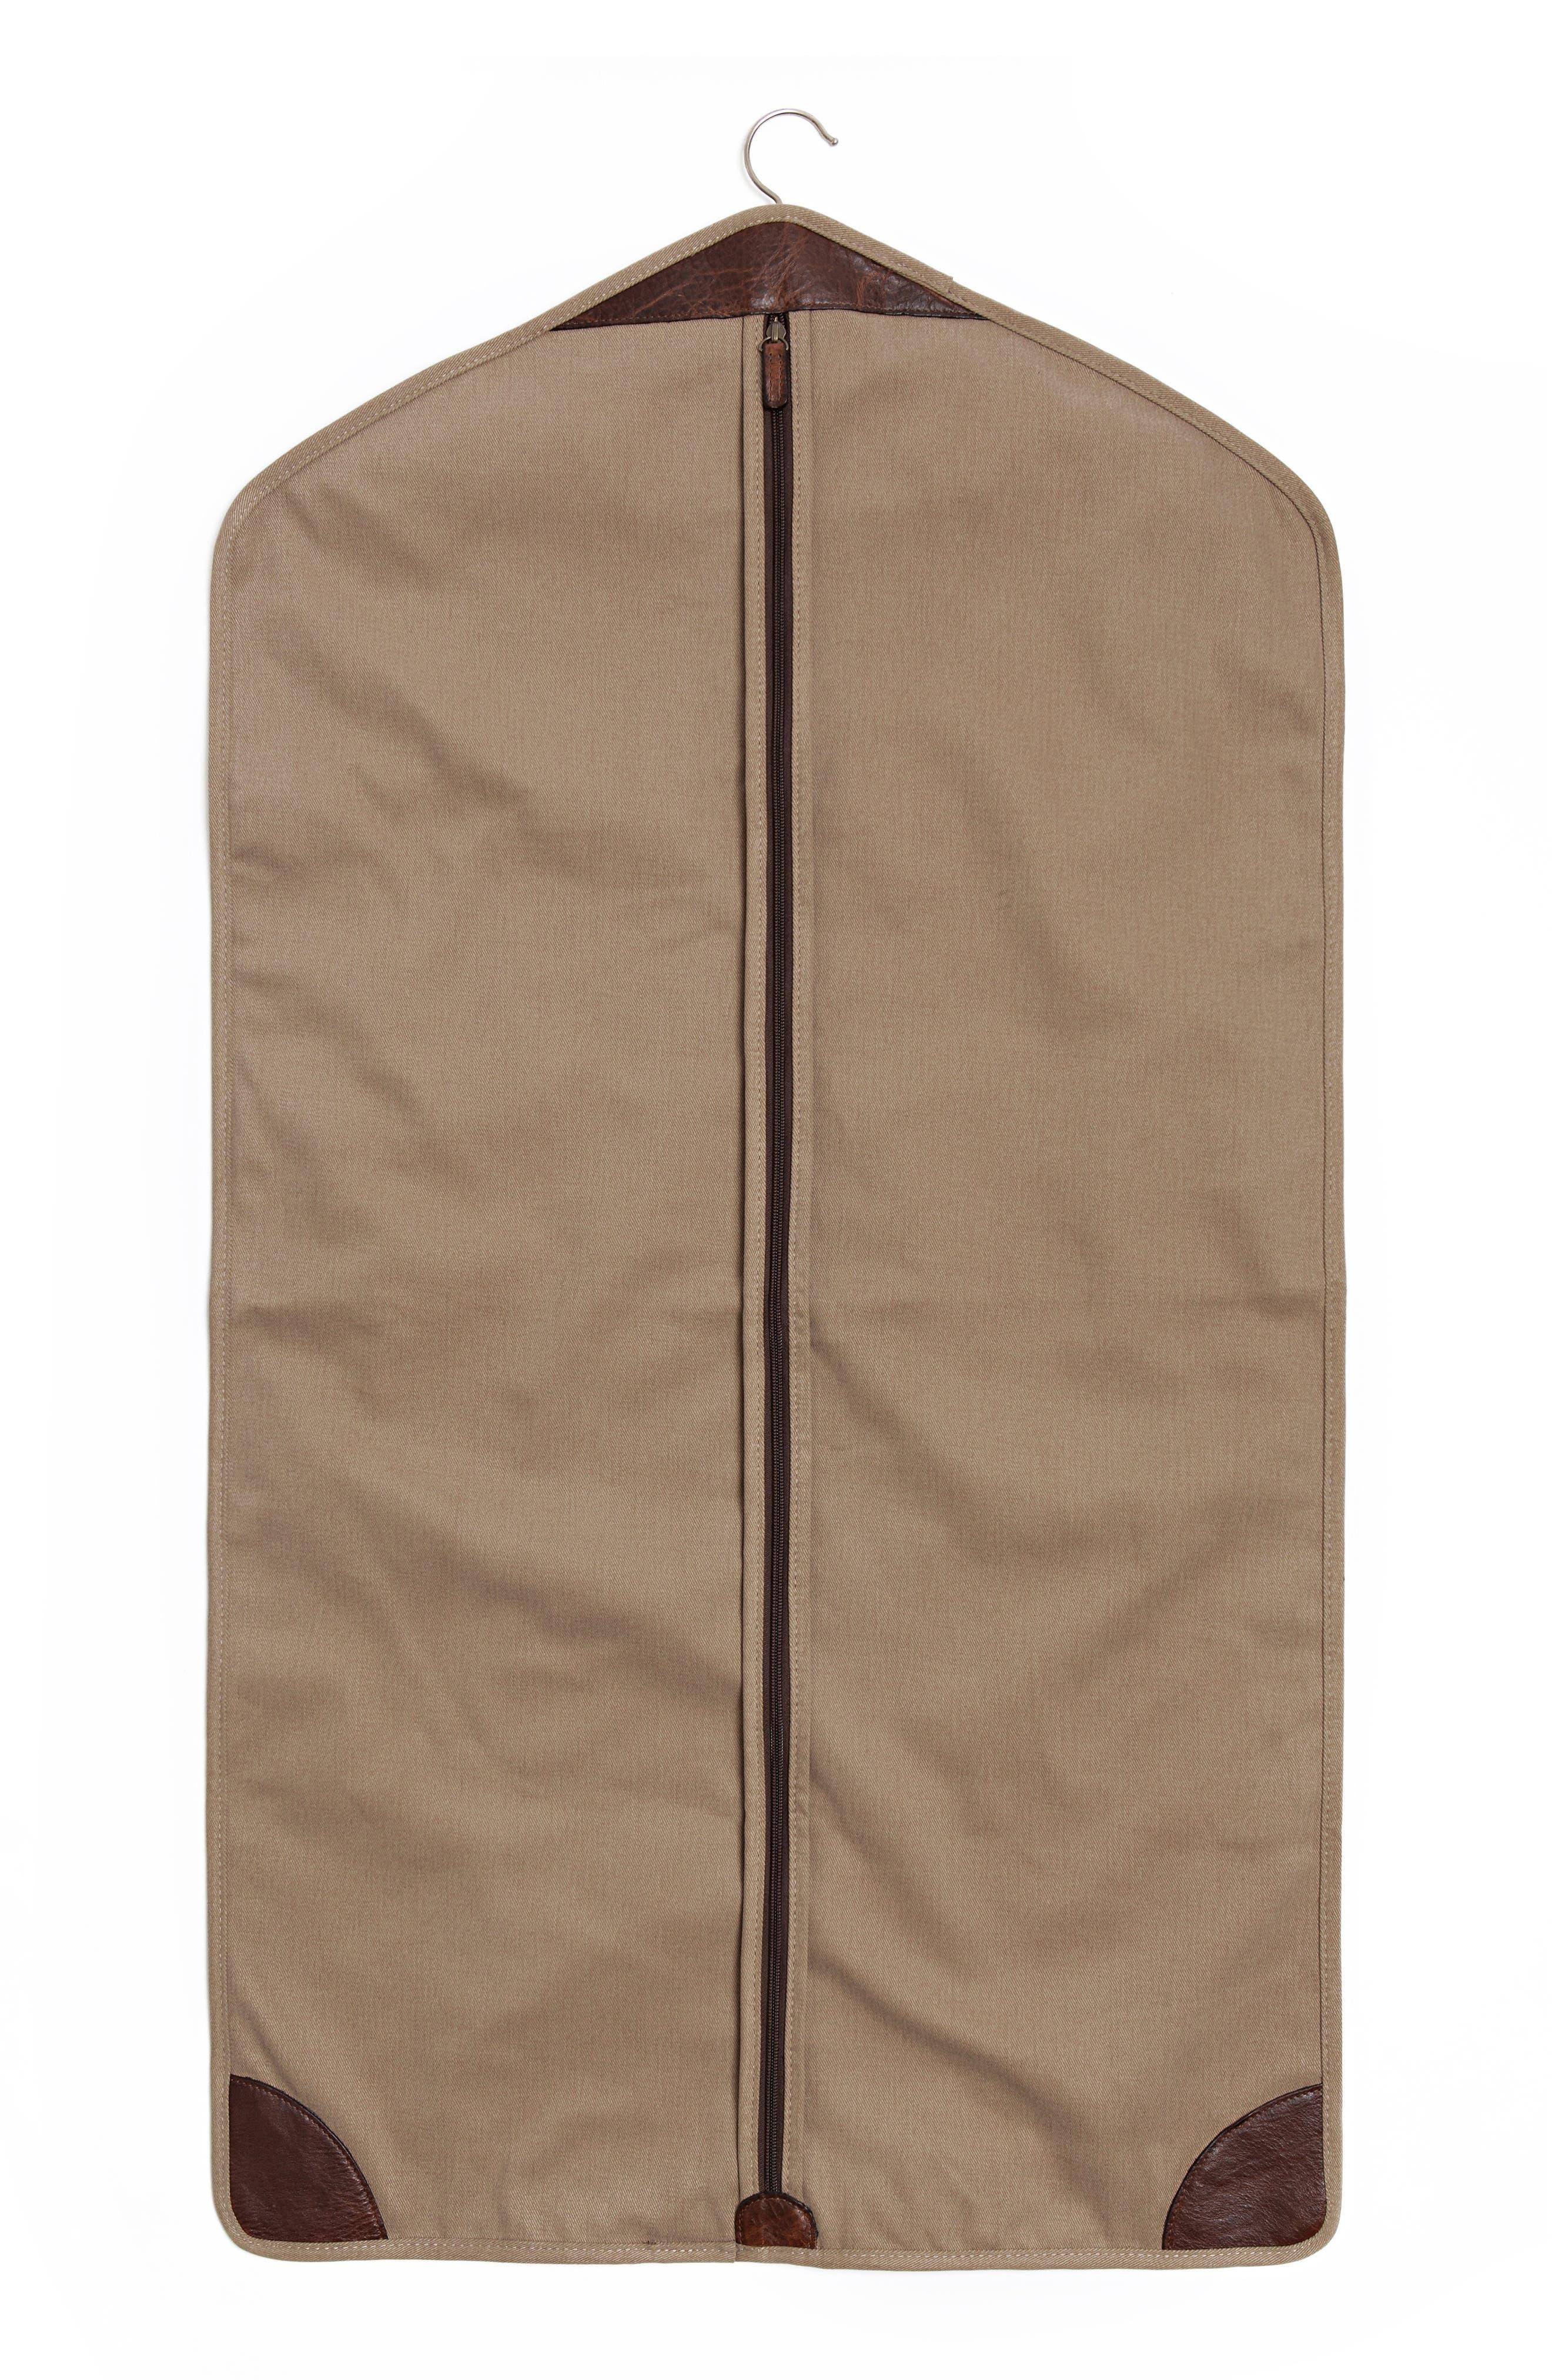 Holton Garment Bag,                             Main thumbnail 1, color,                             Brushed Tan Twill